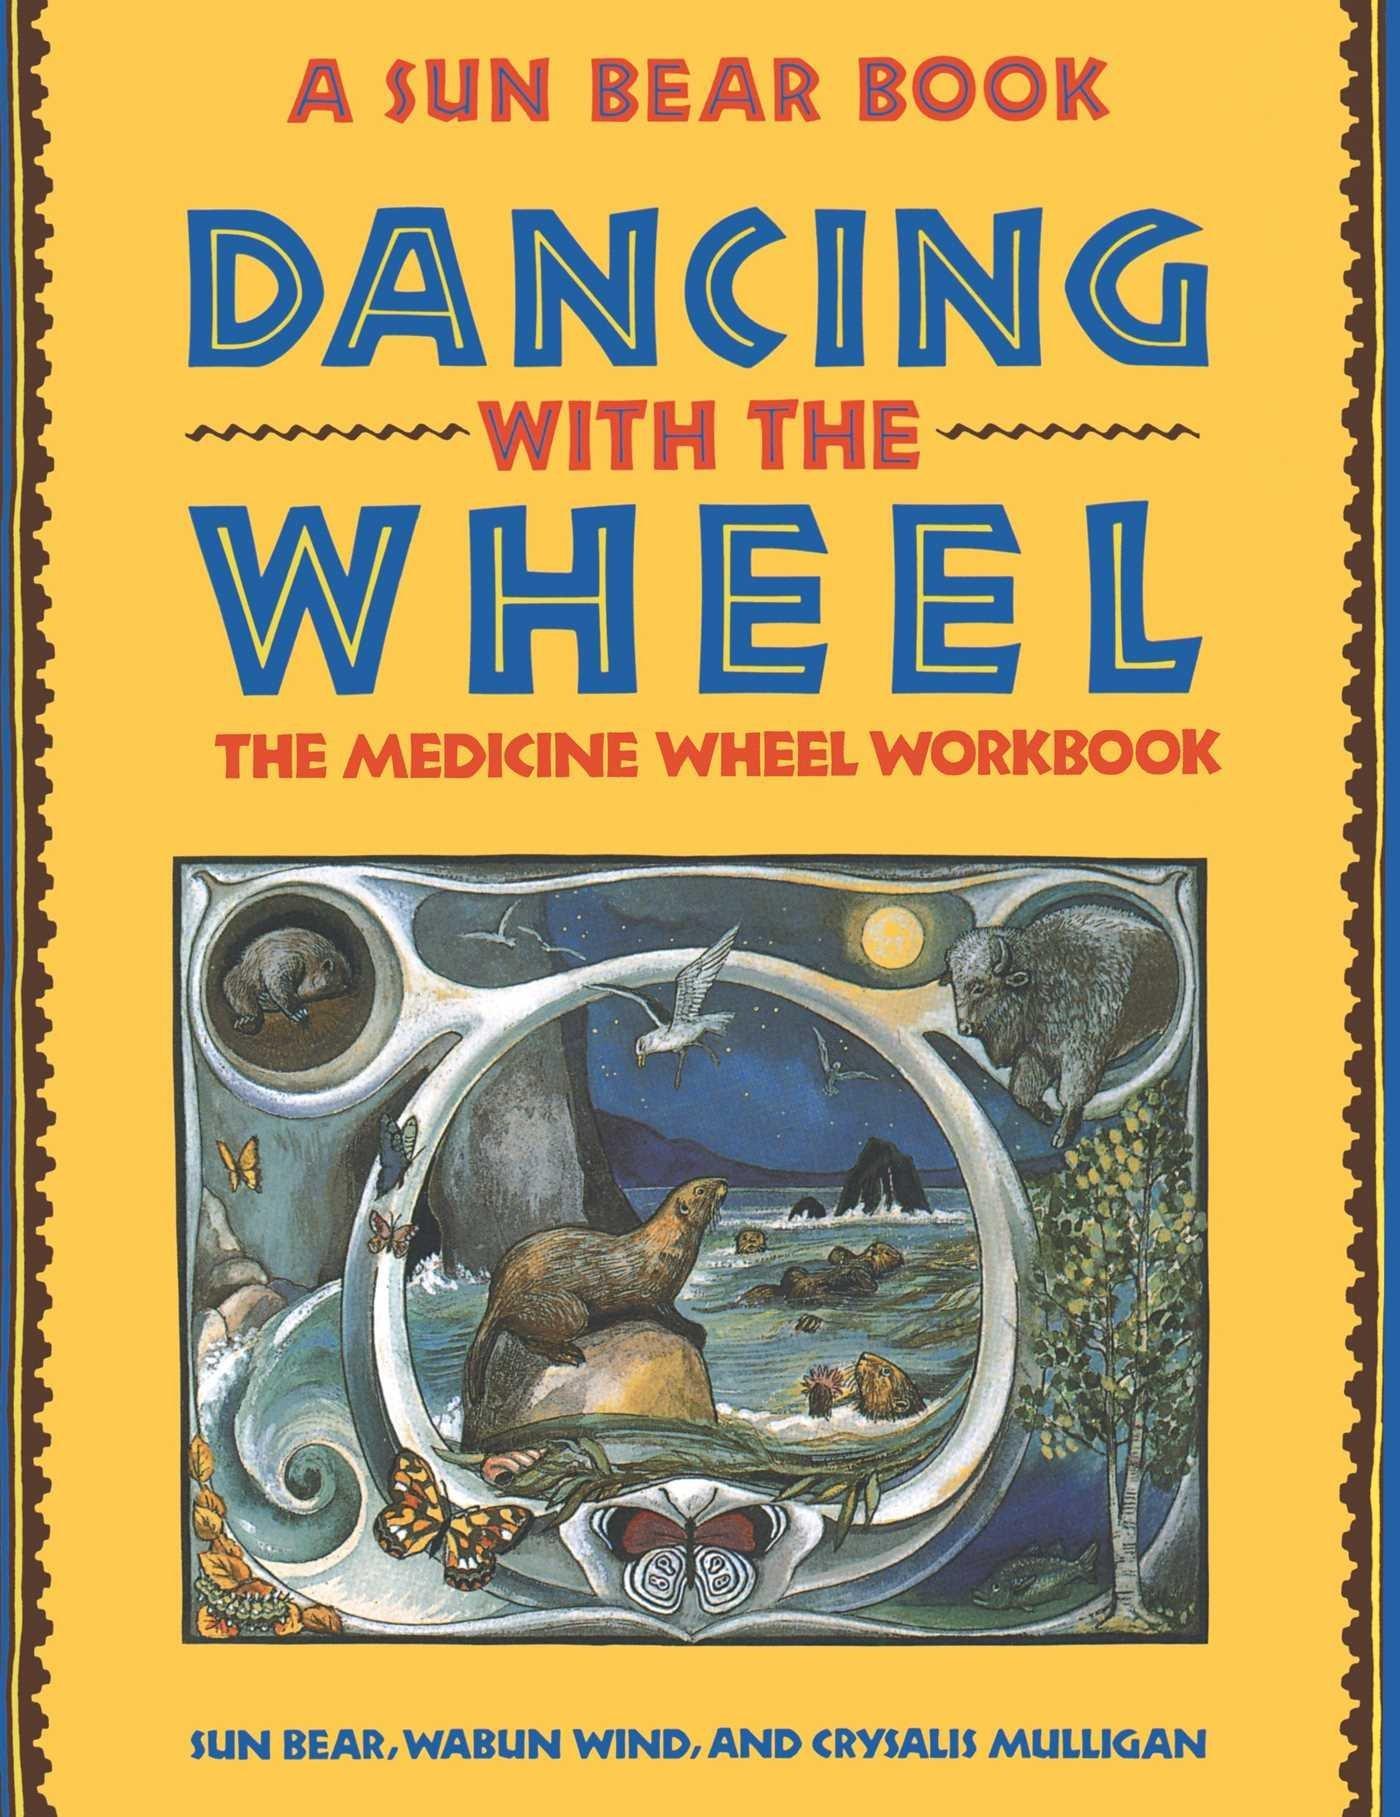 cherokee indian medicine wheel